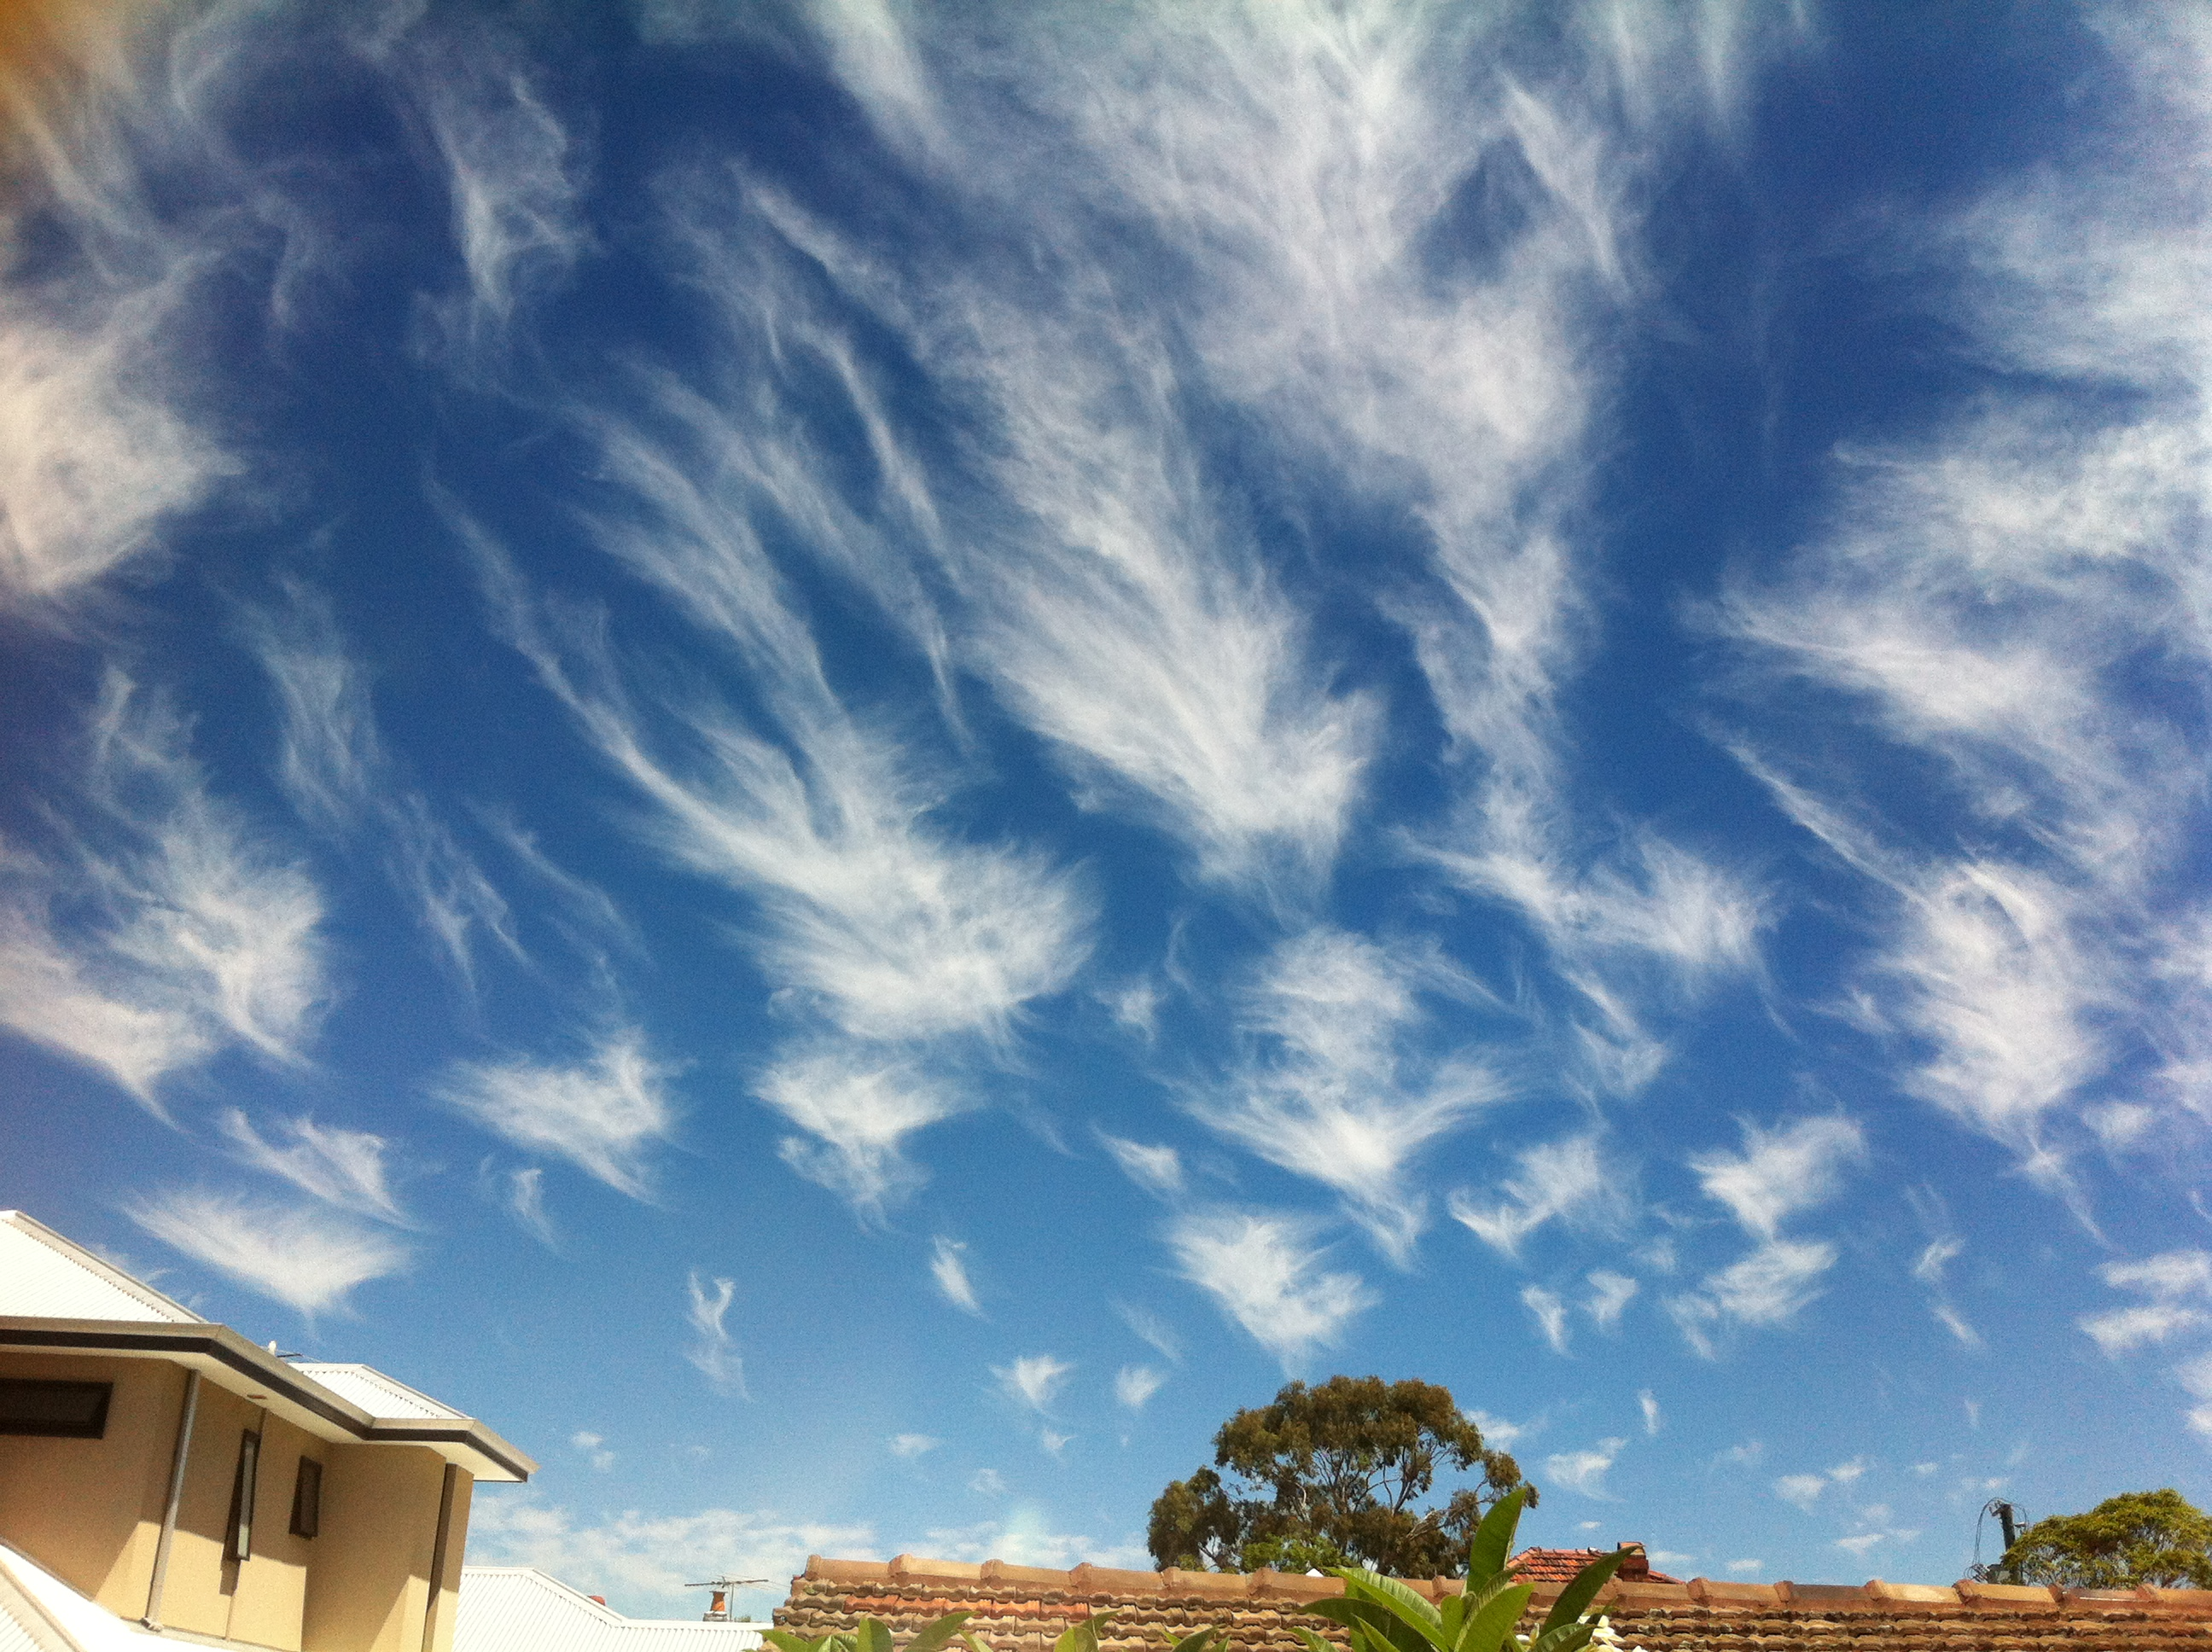 Clouds over Perth